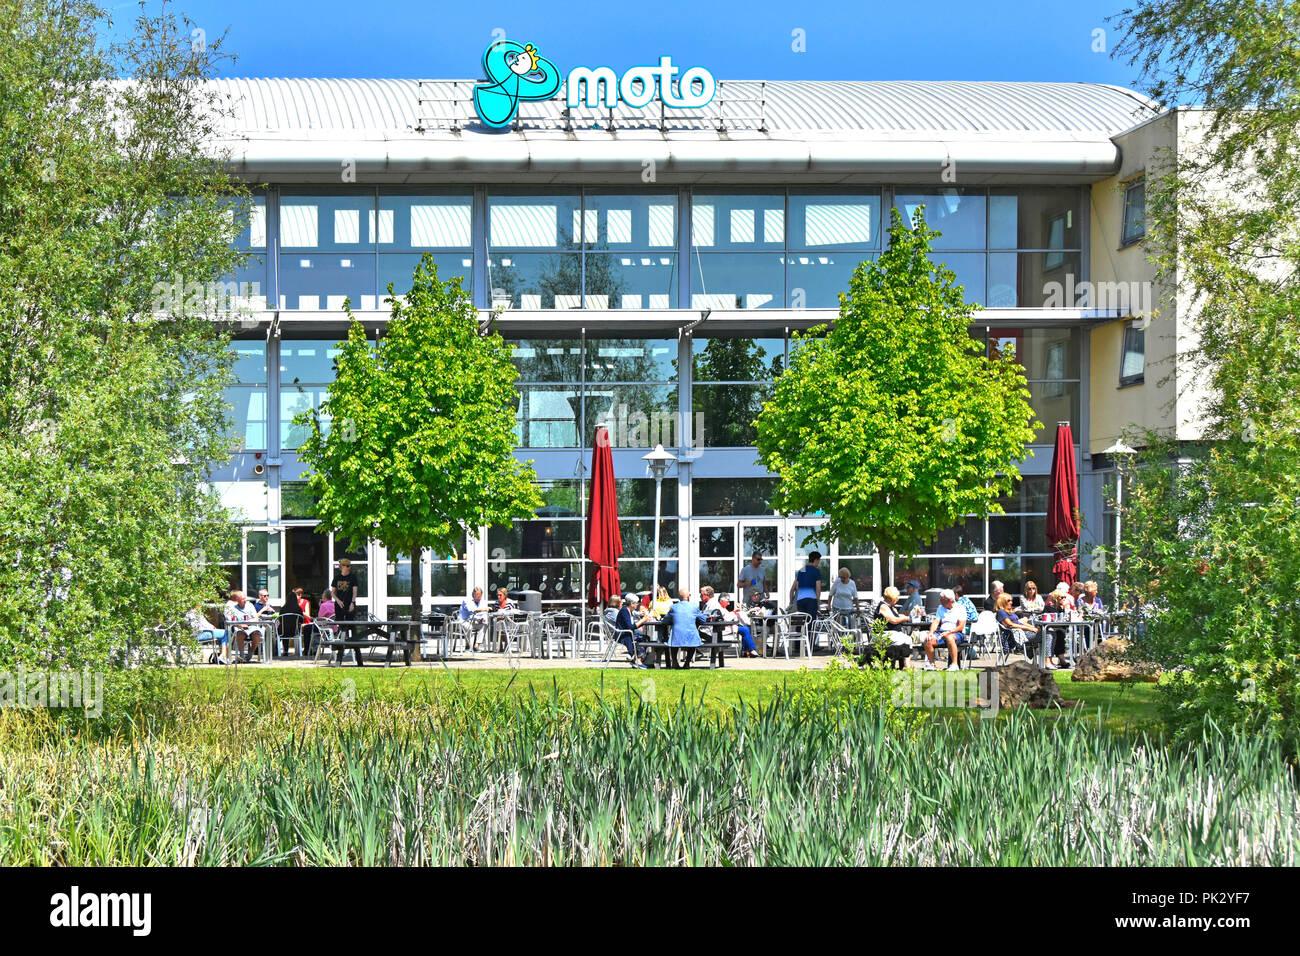 Moto Hospitality M1 motorway services logo & people break journey eating outdoor back of fast food restaurant block Donington Park Leicestershire uk - Stock Image